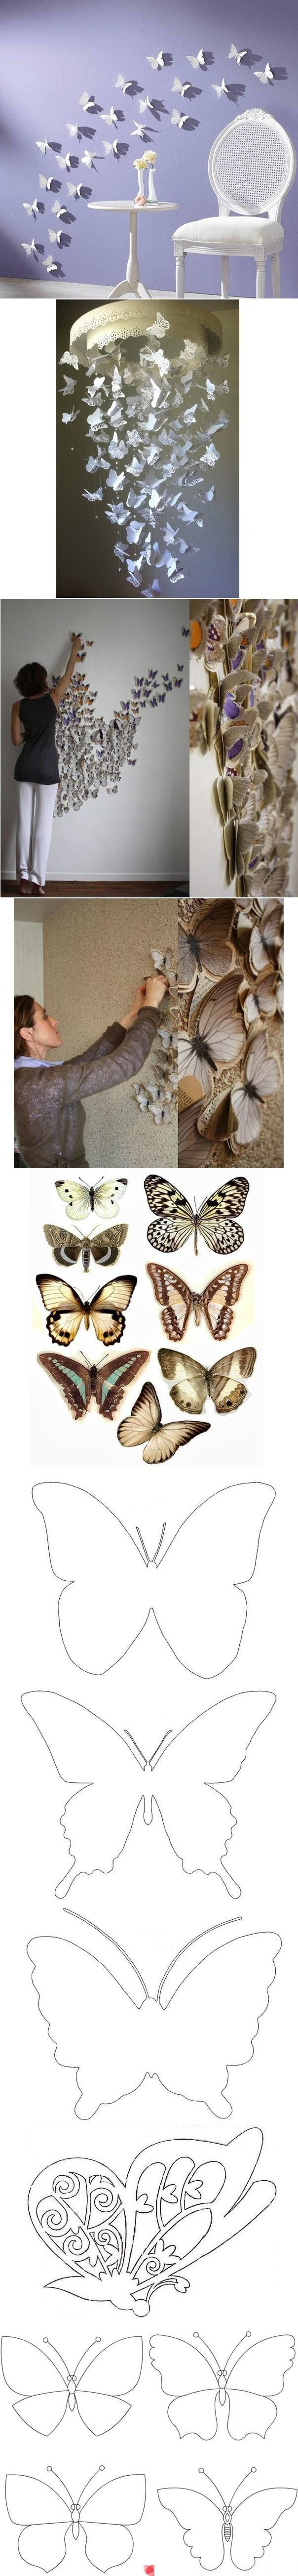 Decoración con mariposas.